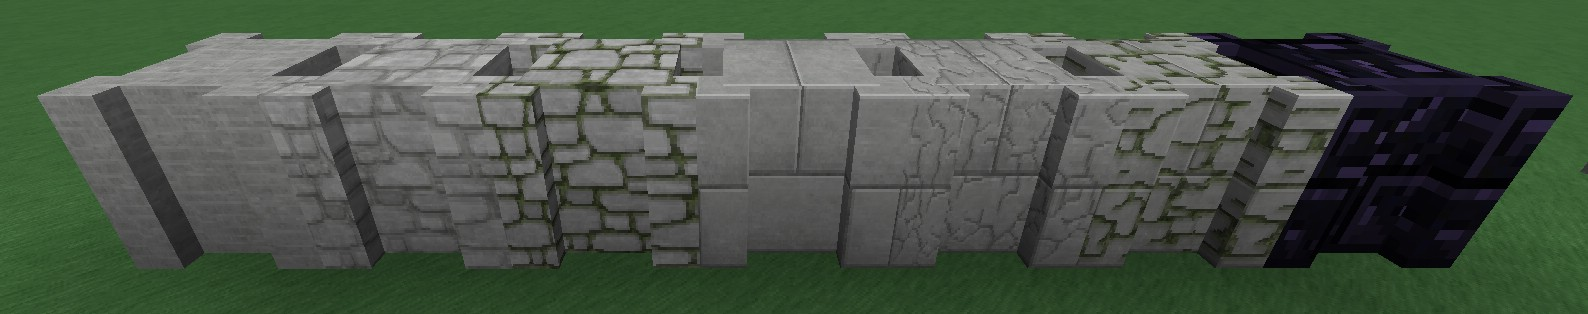 Dungeons-blocks-mod-12.jpg